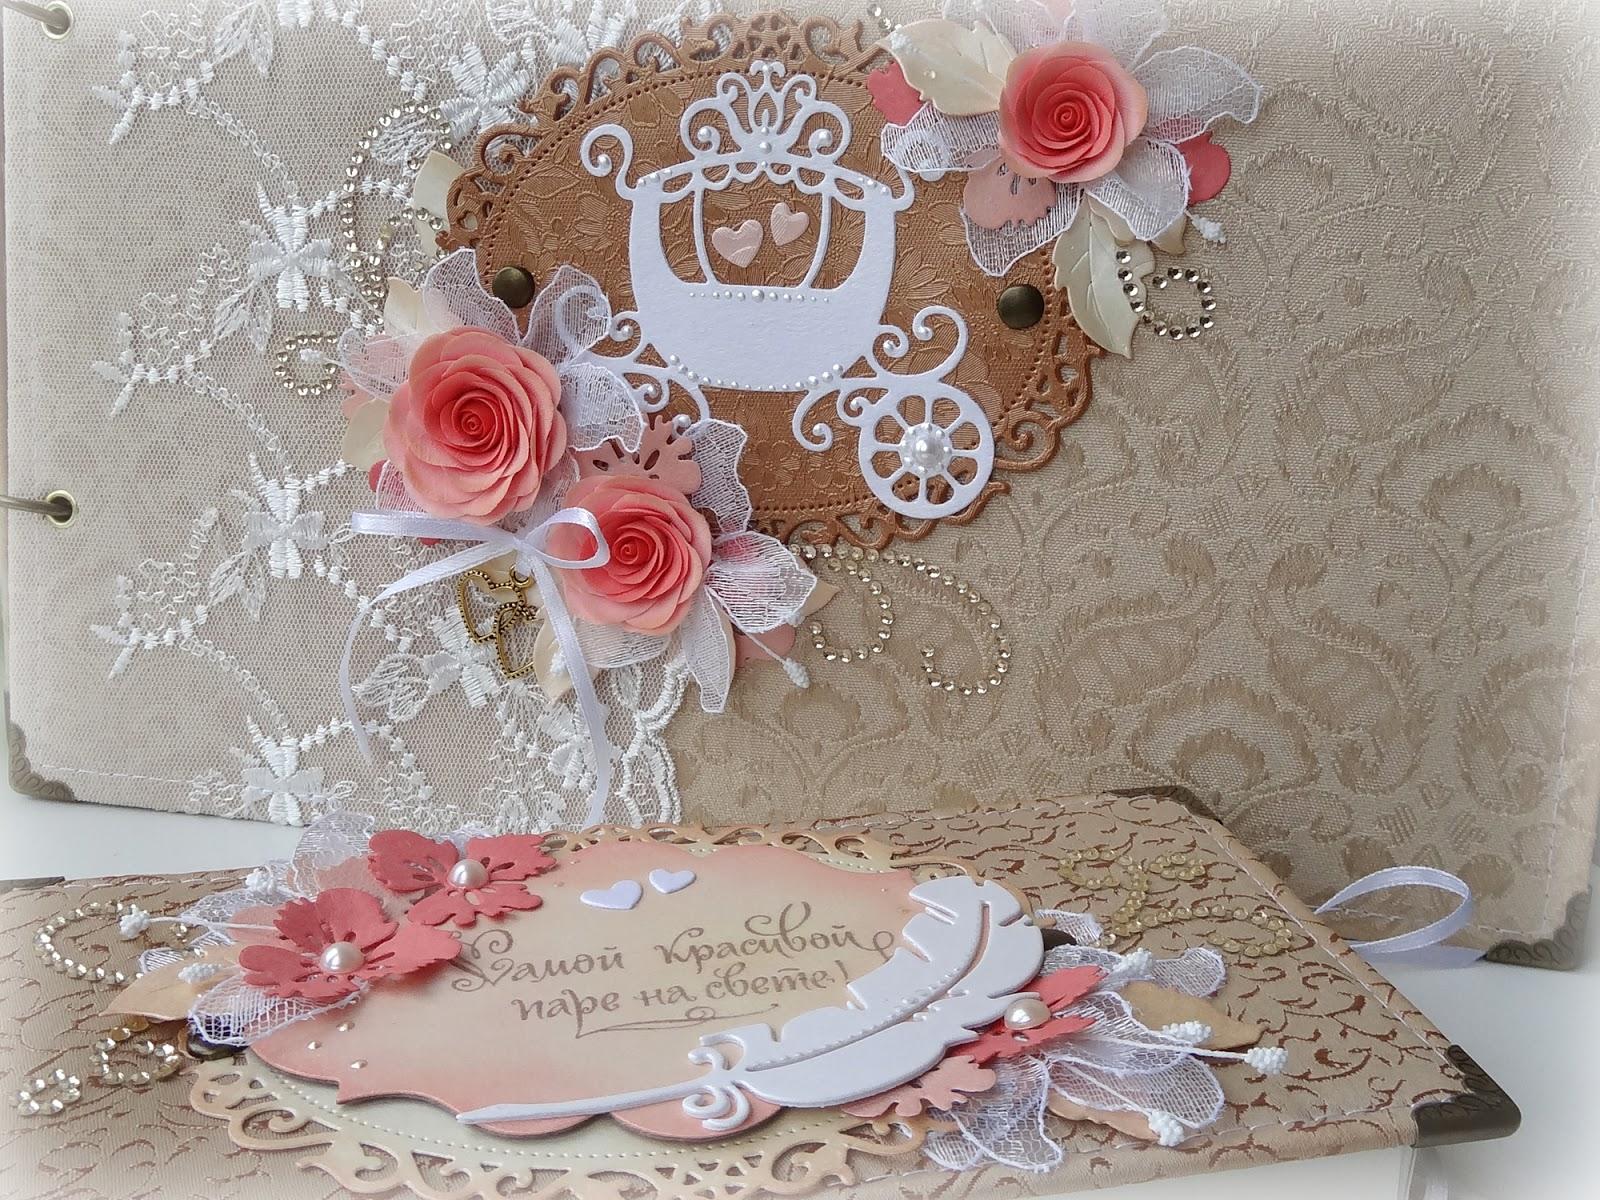 Открытка на свадьбу от бабушки 7